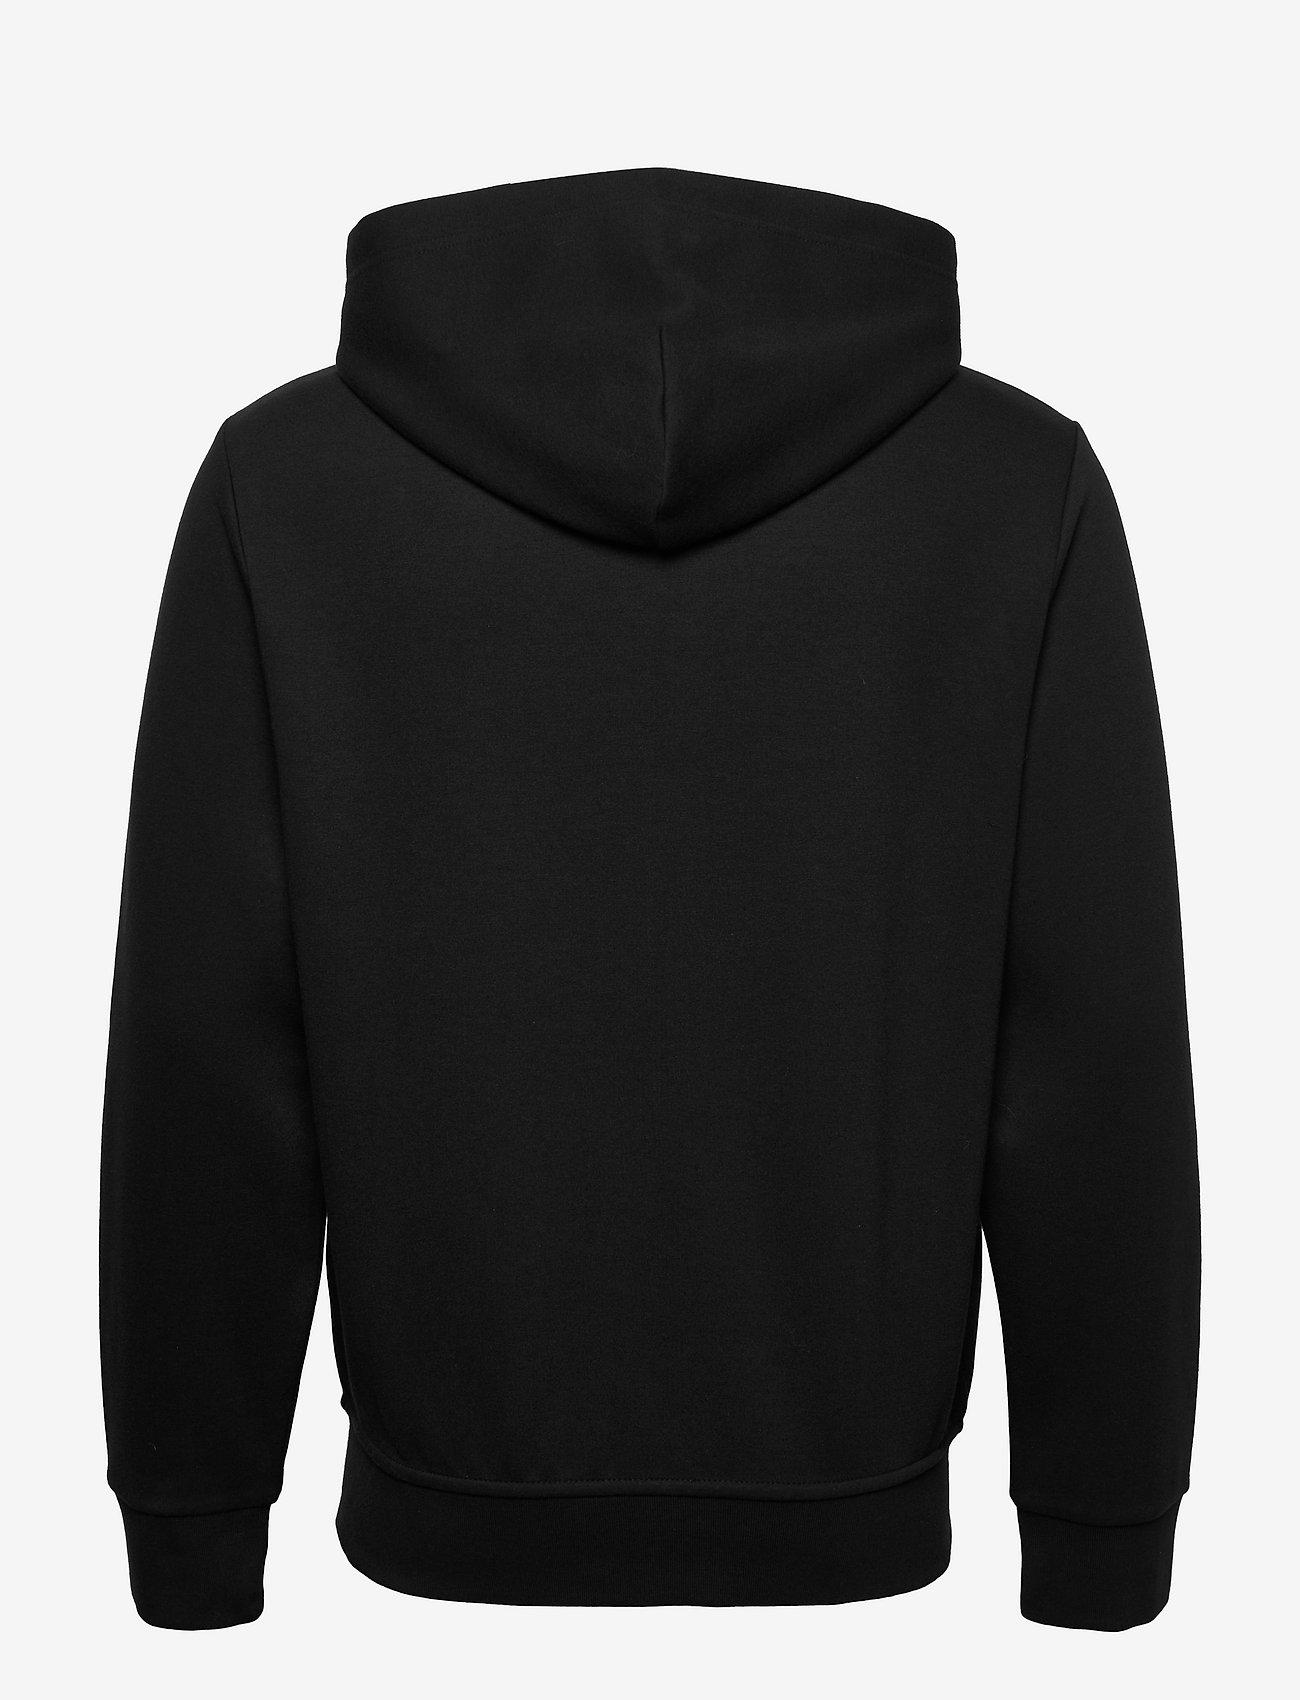 Double-knit Full-zip Hoodie (Polo Black) - Polo Ralph Lauren EKWciV